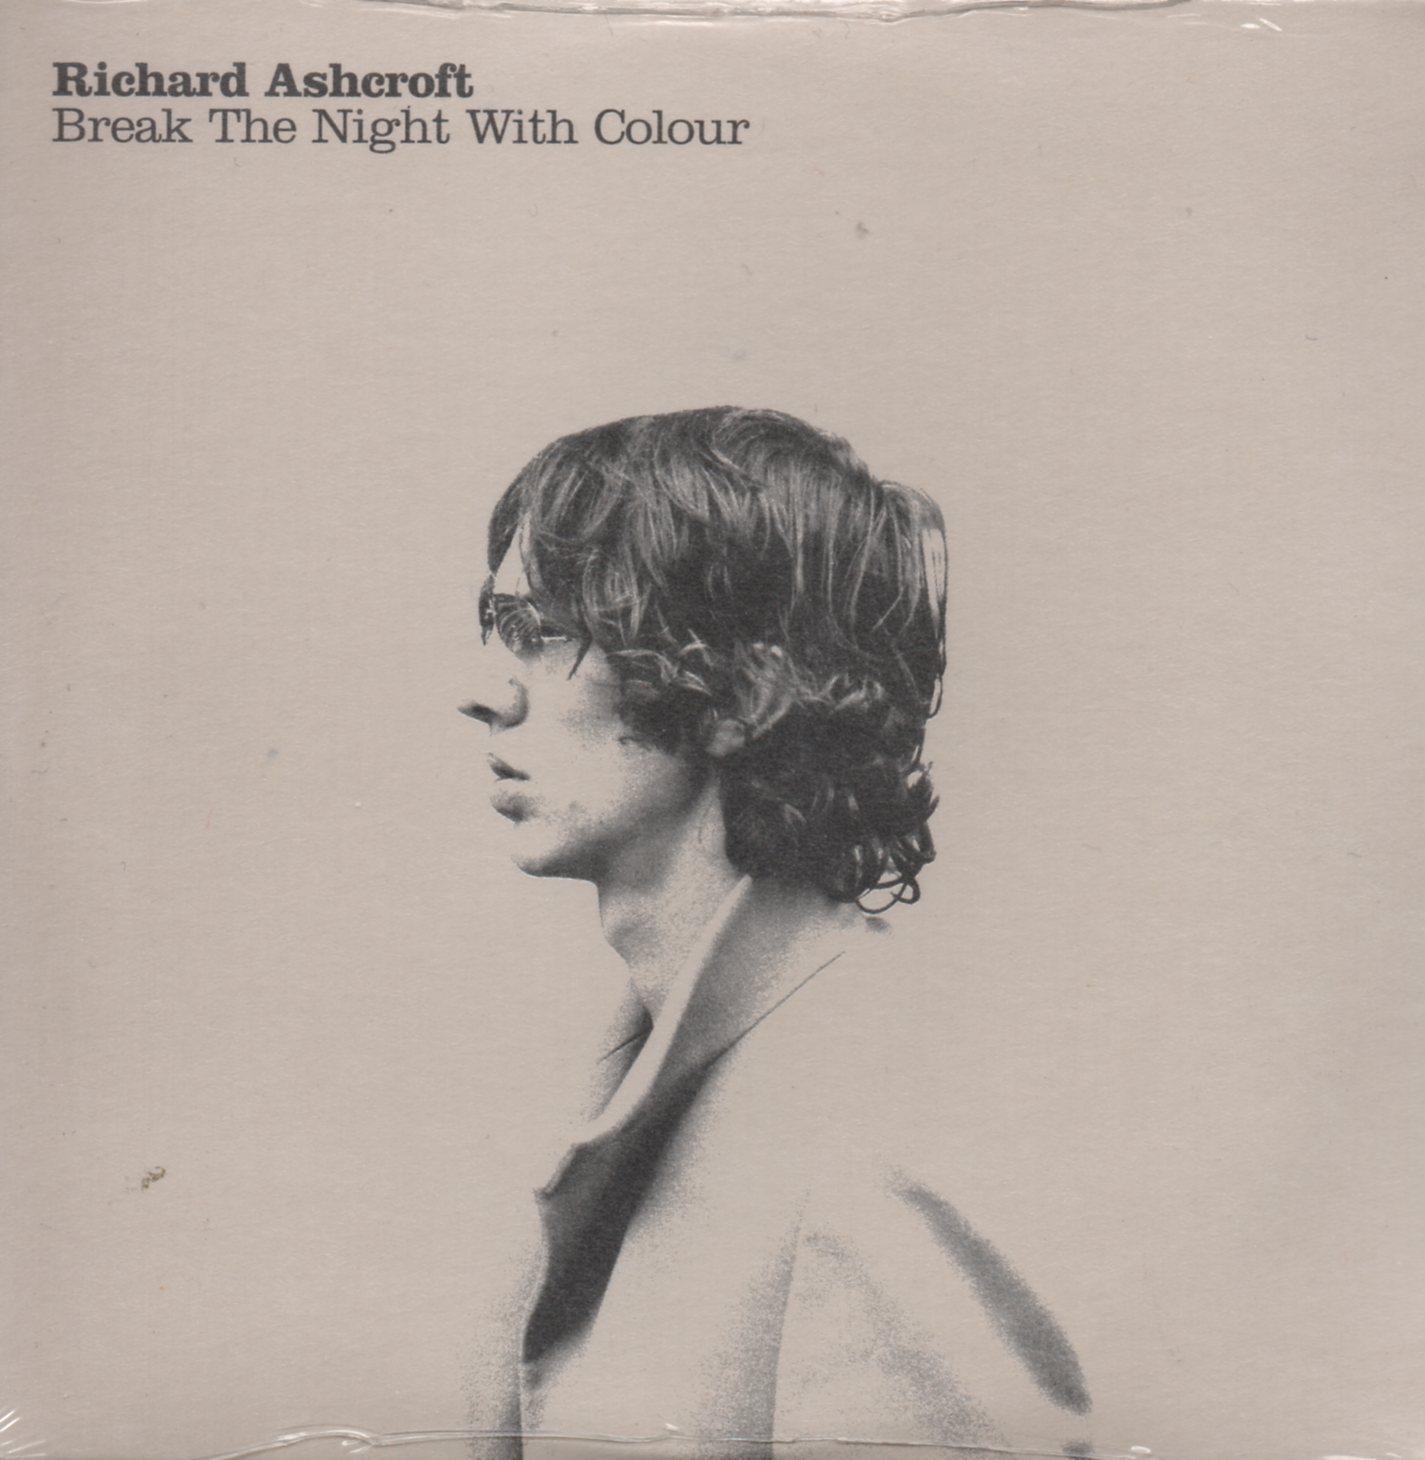 RICHARD ASHCROFT - Break The Night With Colour UK Promo CD single (CD5 / 5'') - CD single